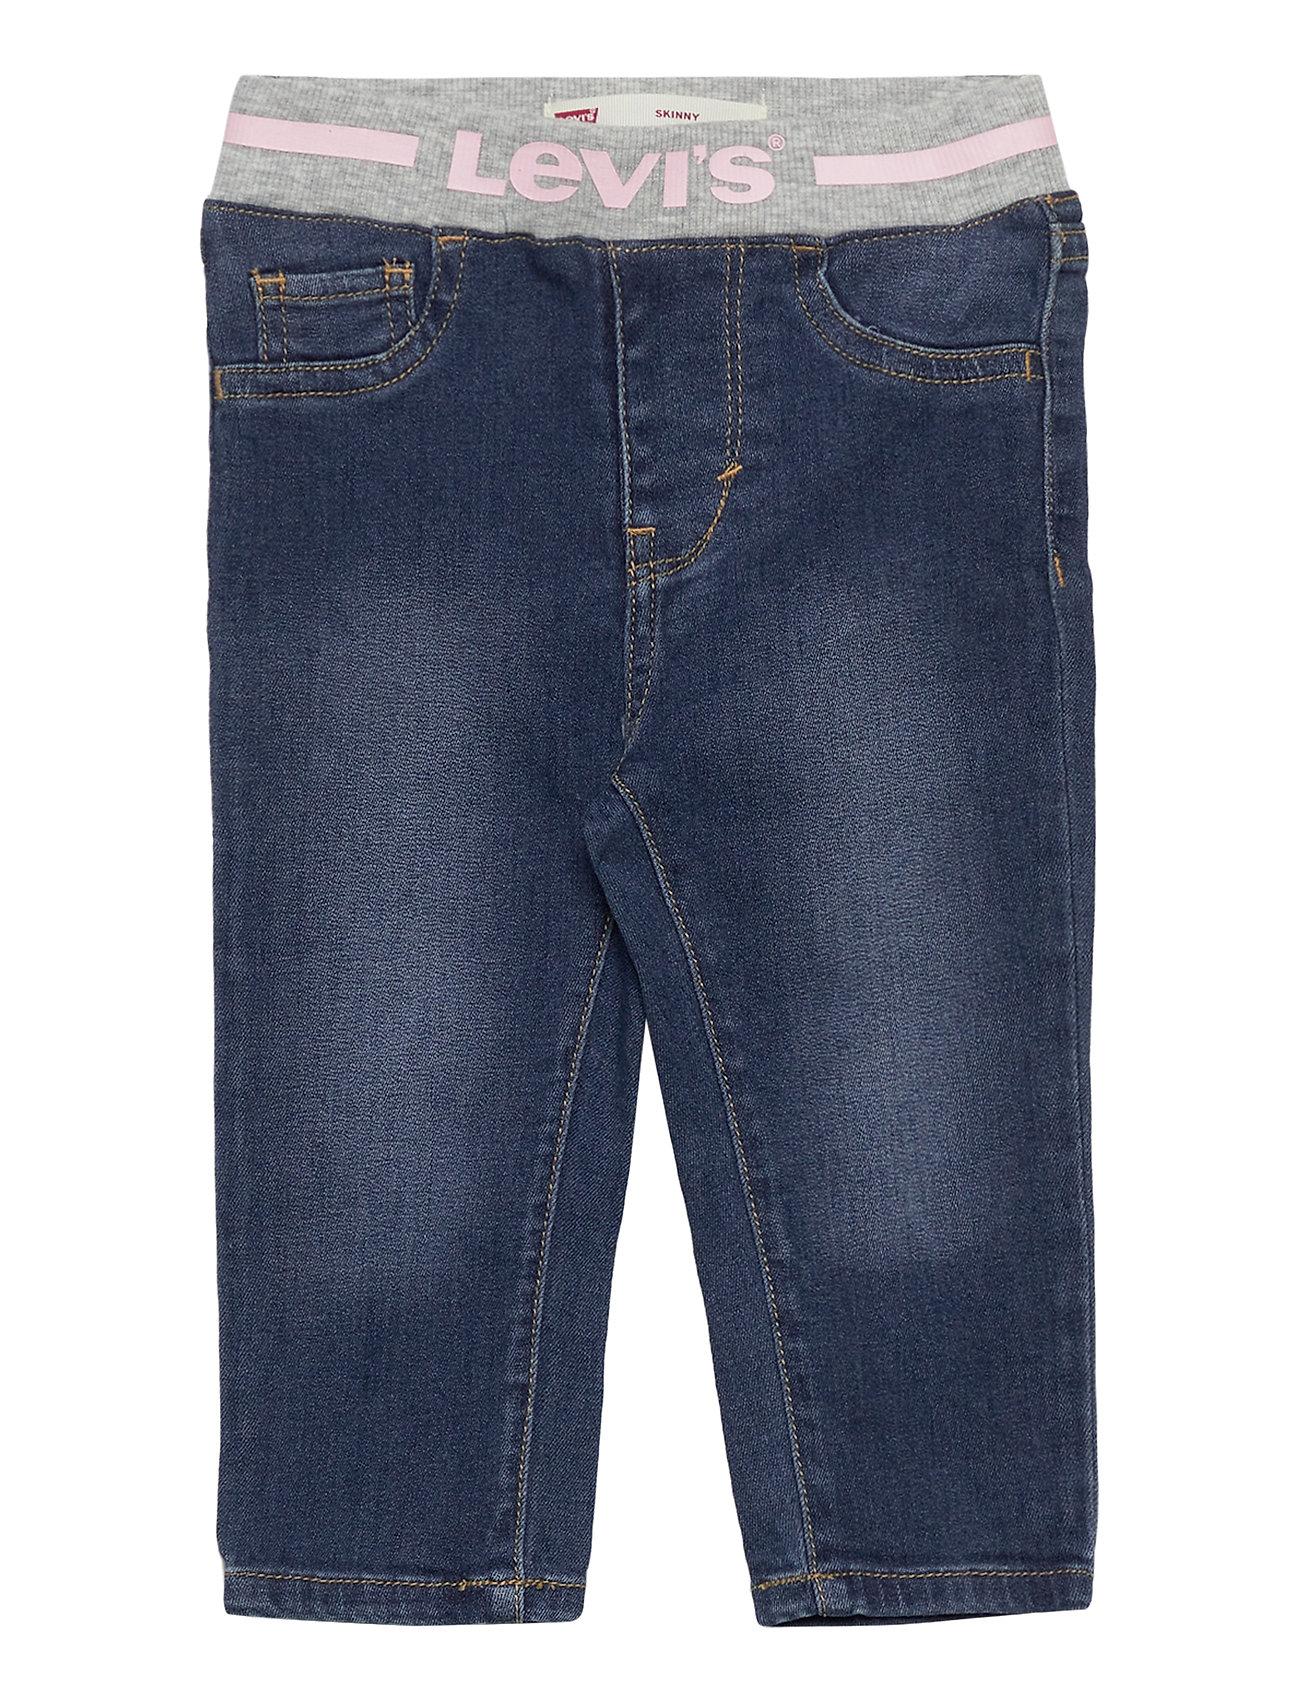 Image of Pull On Skinny Jean Jeans Blå Levi's (3440209543)